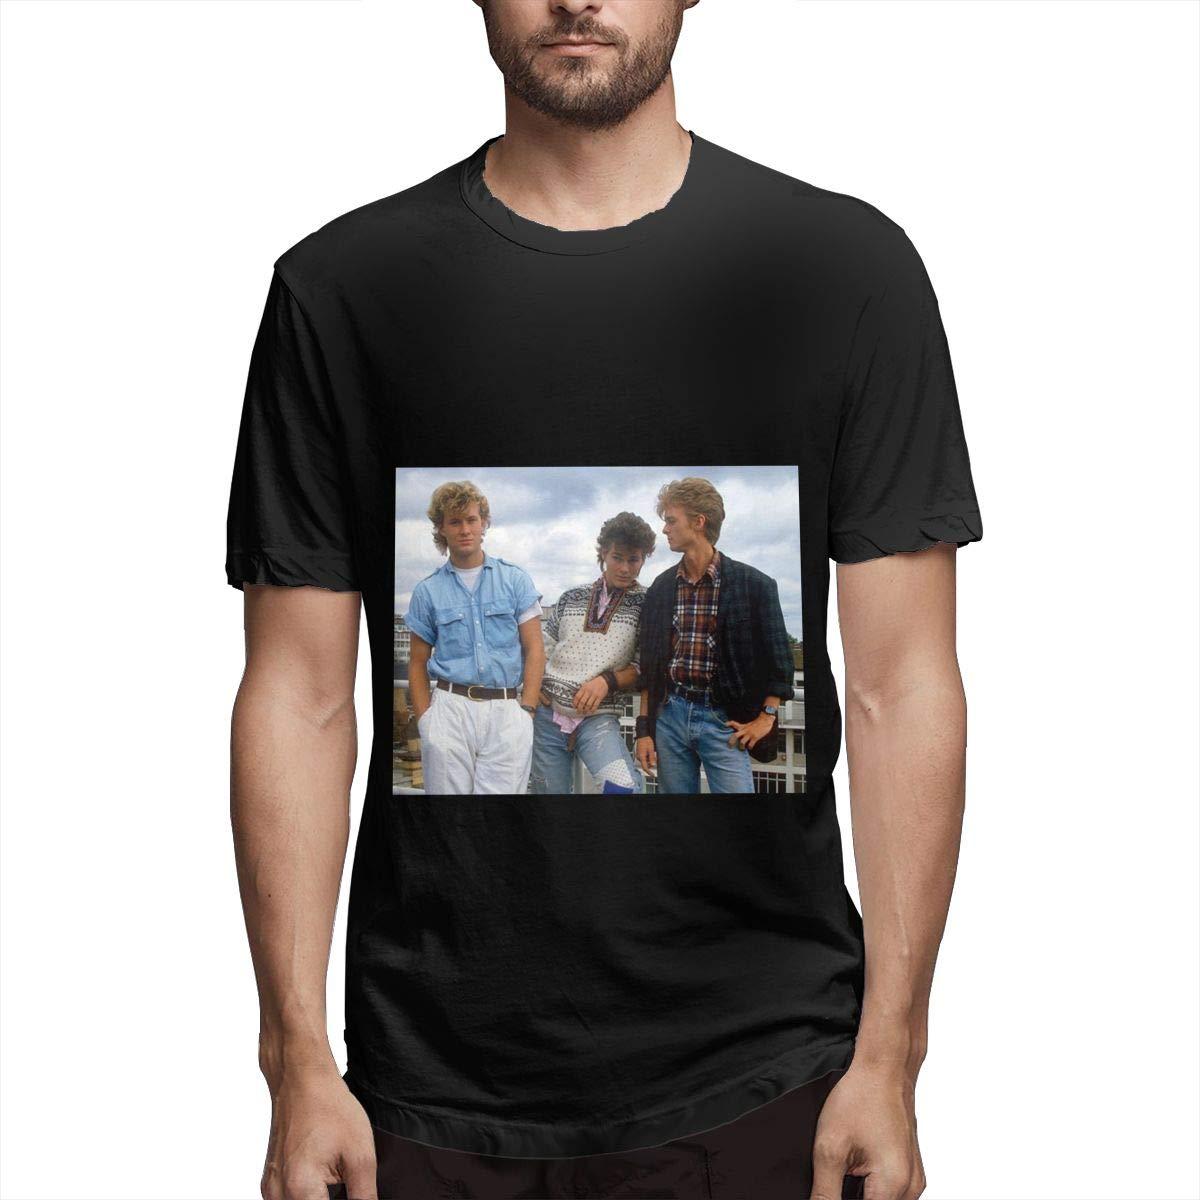 Lihehen S A Ha Retro Printing Round Neck Tees Shirts